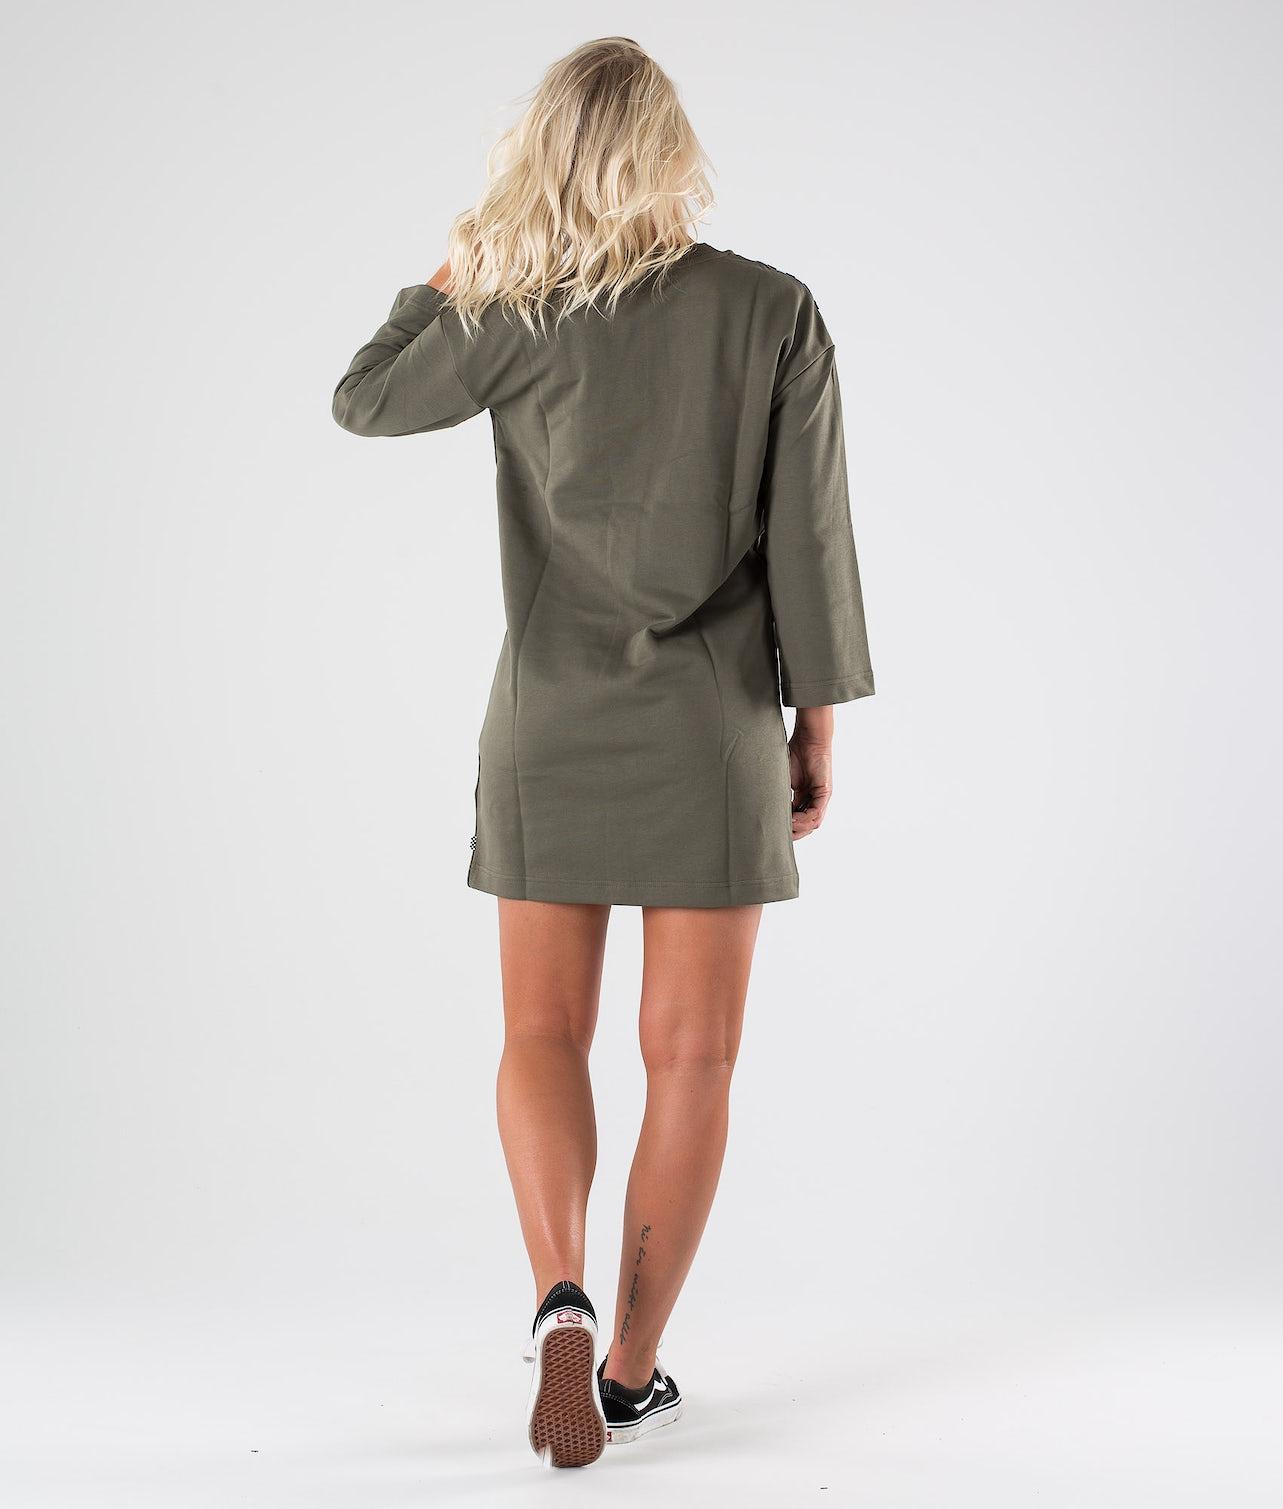 Buy Chromo II Dress Dress from Vans at Ridestore.com - Always free shipping, free returns and 30 days money back guarantee